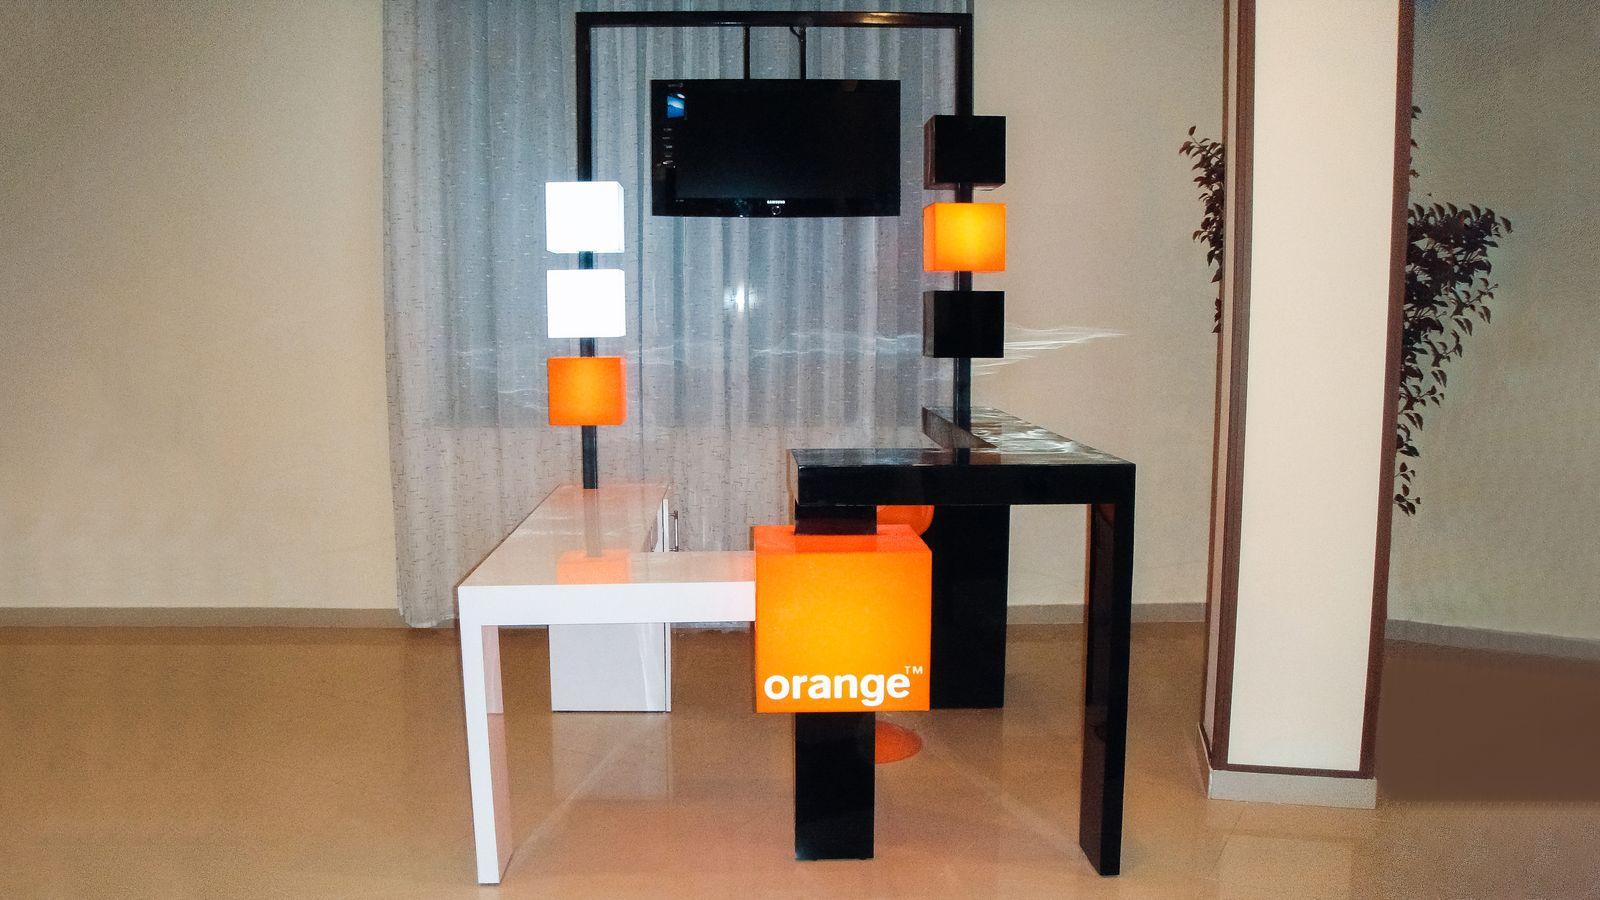 decorative illuminated table